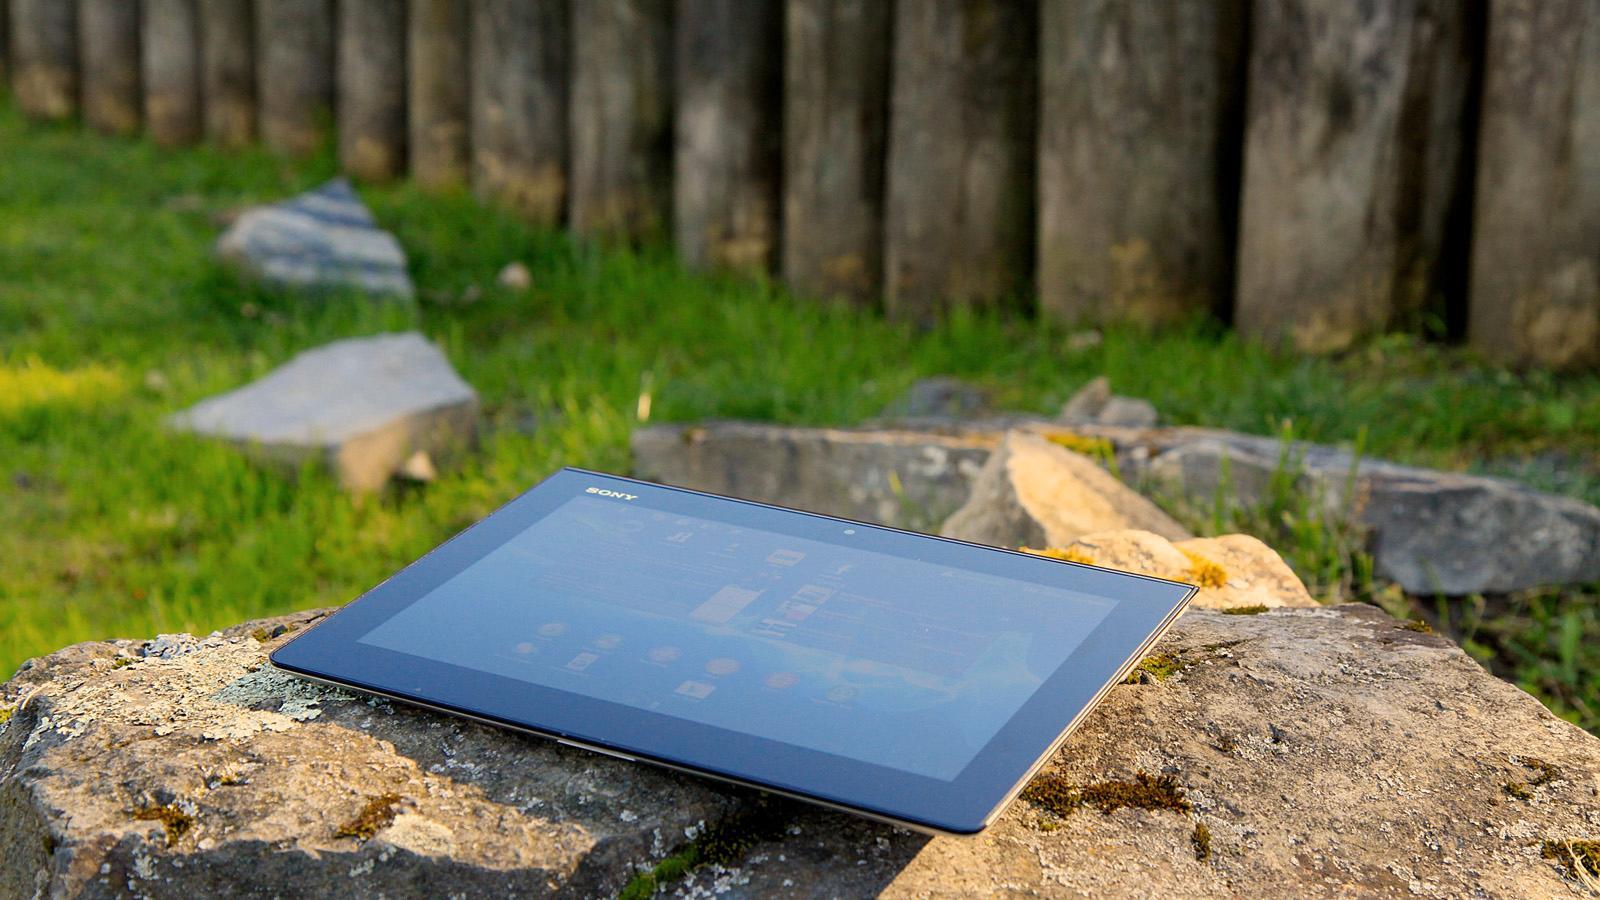 Sony Xperia Tablet S. .Foto: Kurt Lekanger, Amobil.no